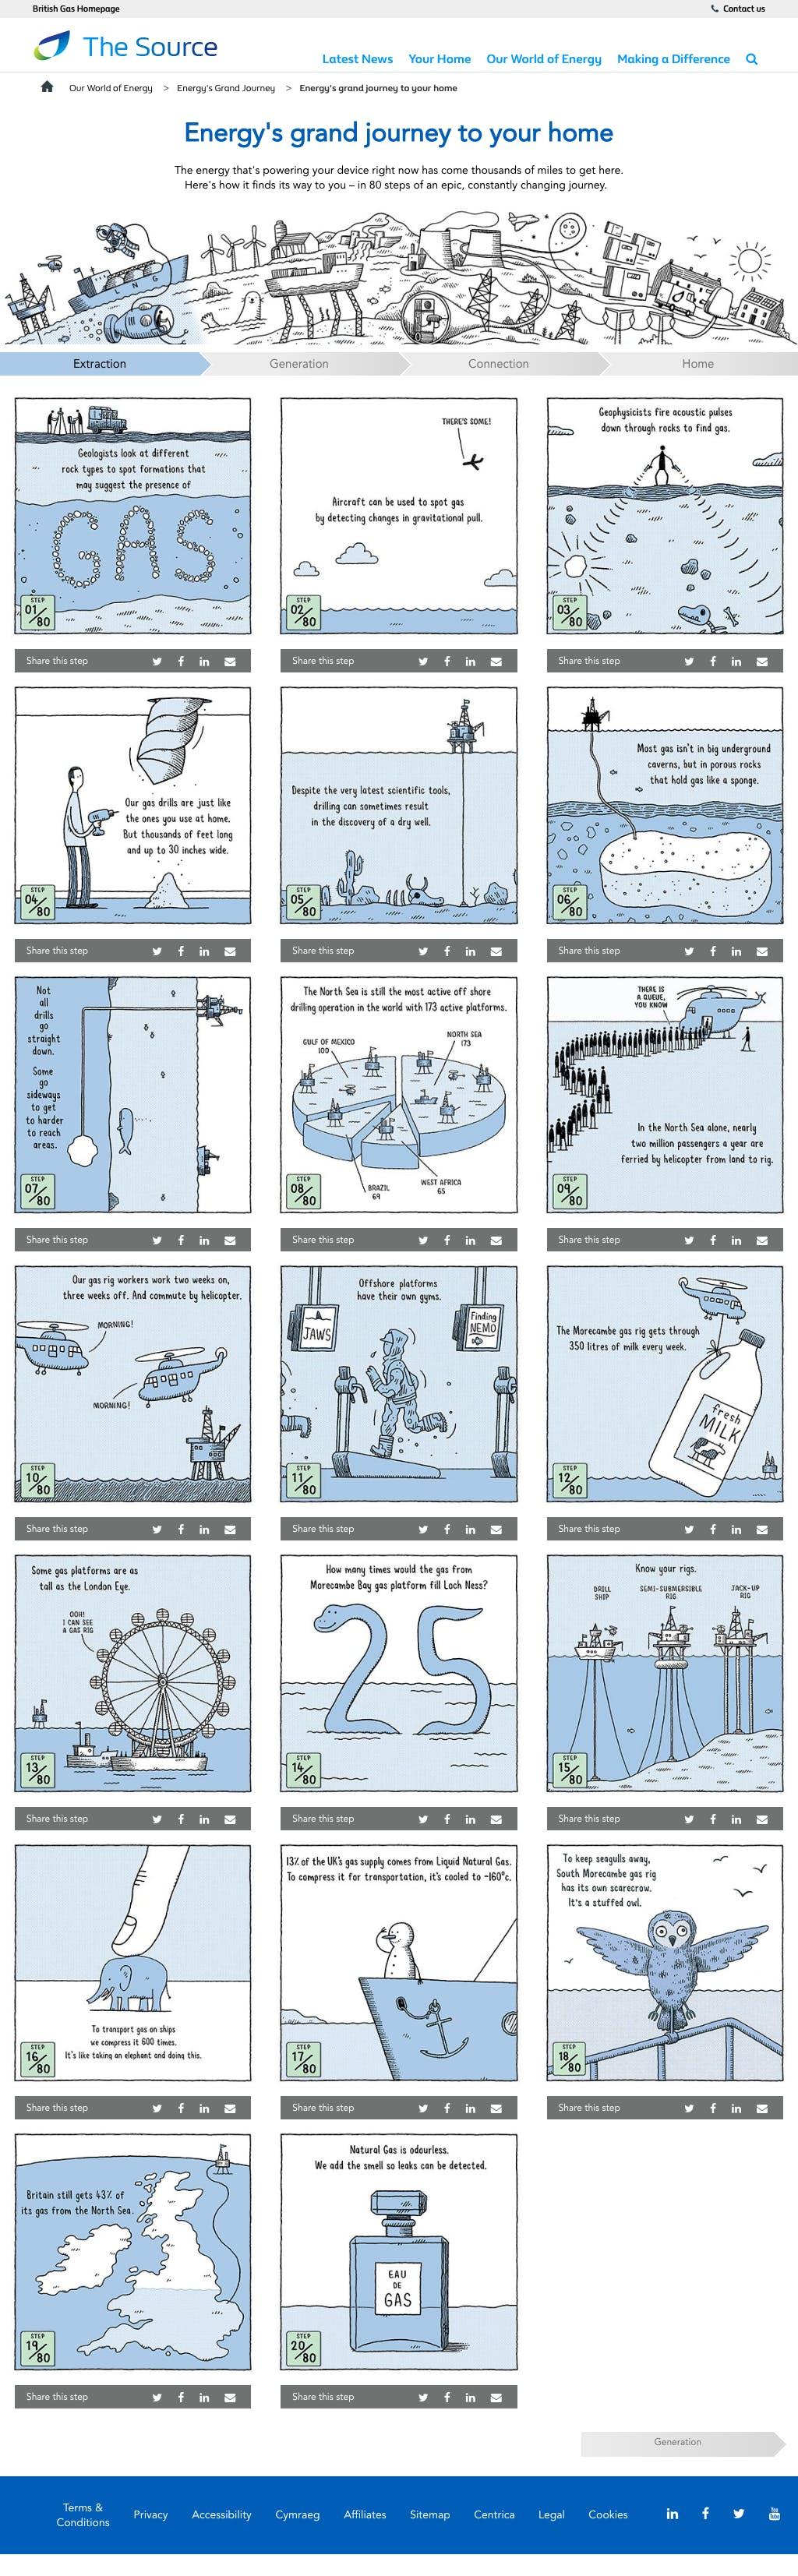 British Gas Energy's Grand Journey 1024